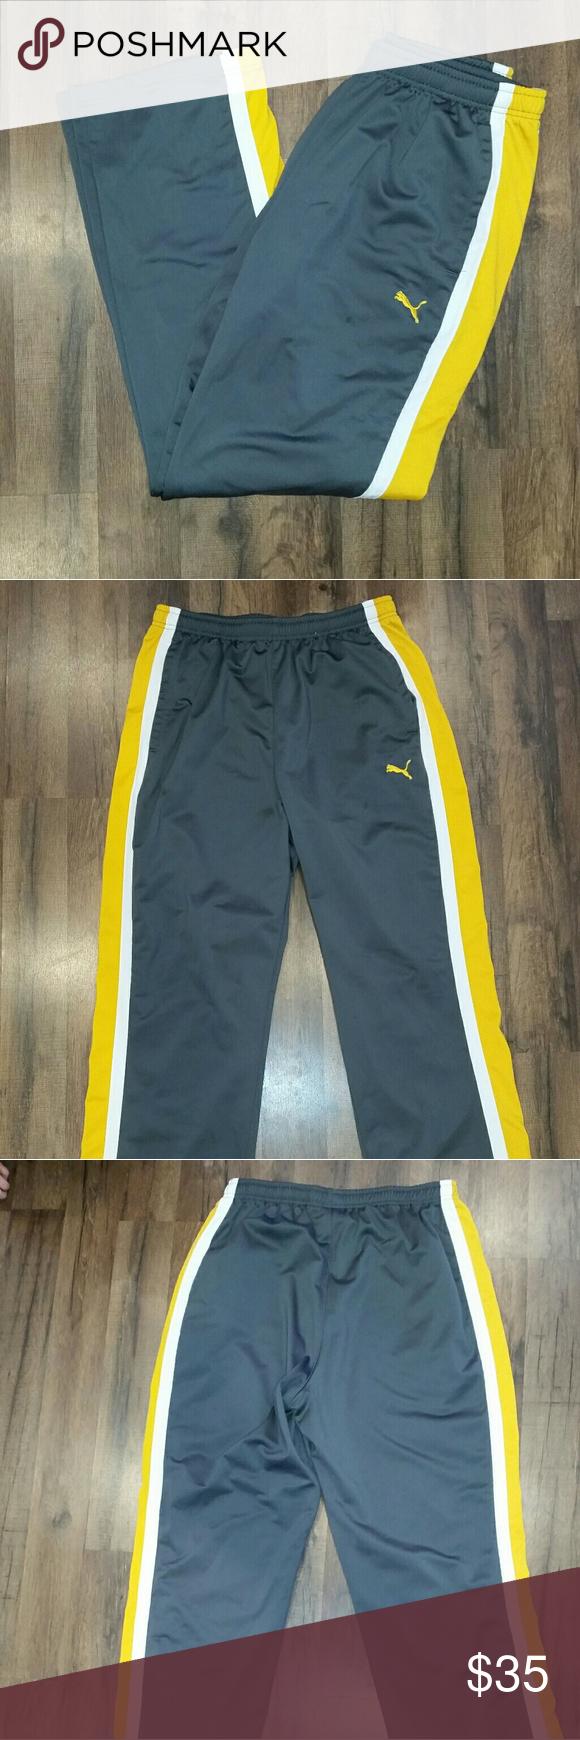 ba74181fefe6 Puma Men s pants Grey with yellow and white stripes down the outter leg.  GREAT shape. Men s size L. Puma Pants Sweatpants   Joggers